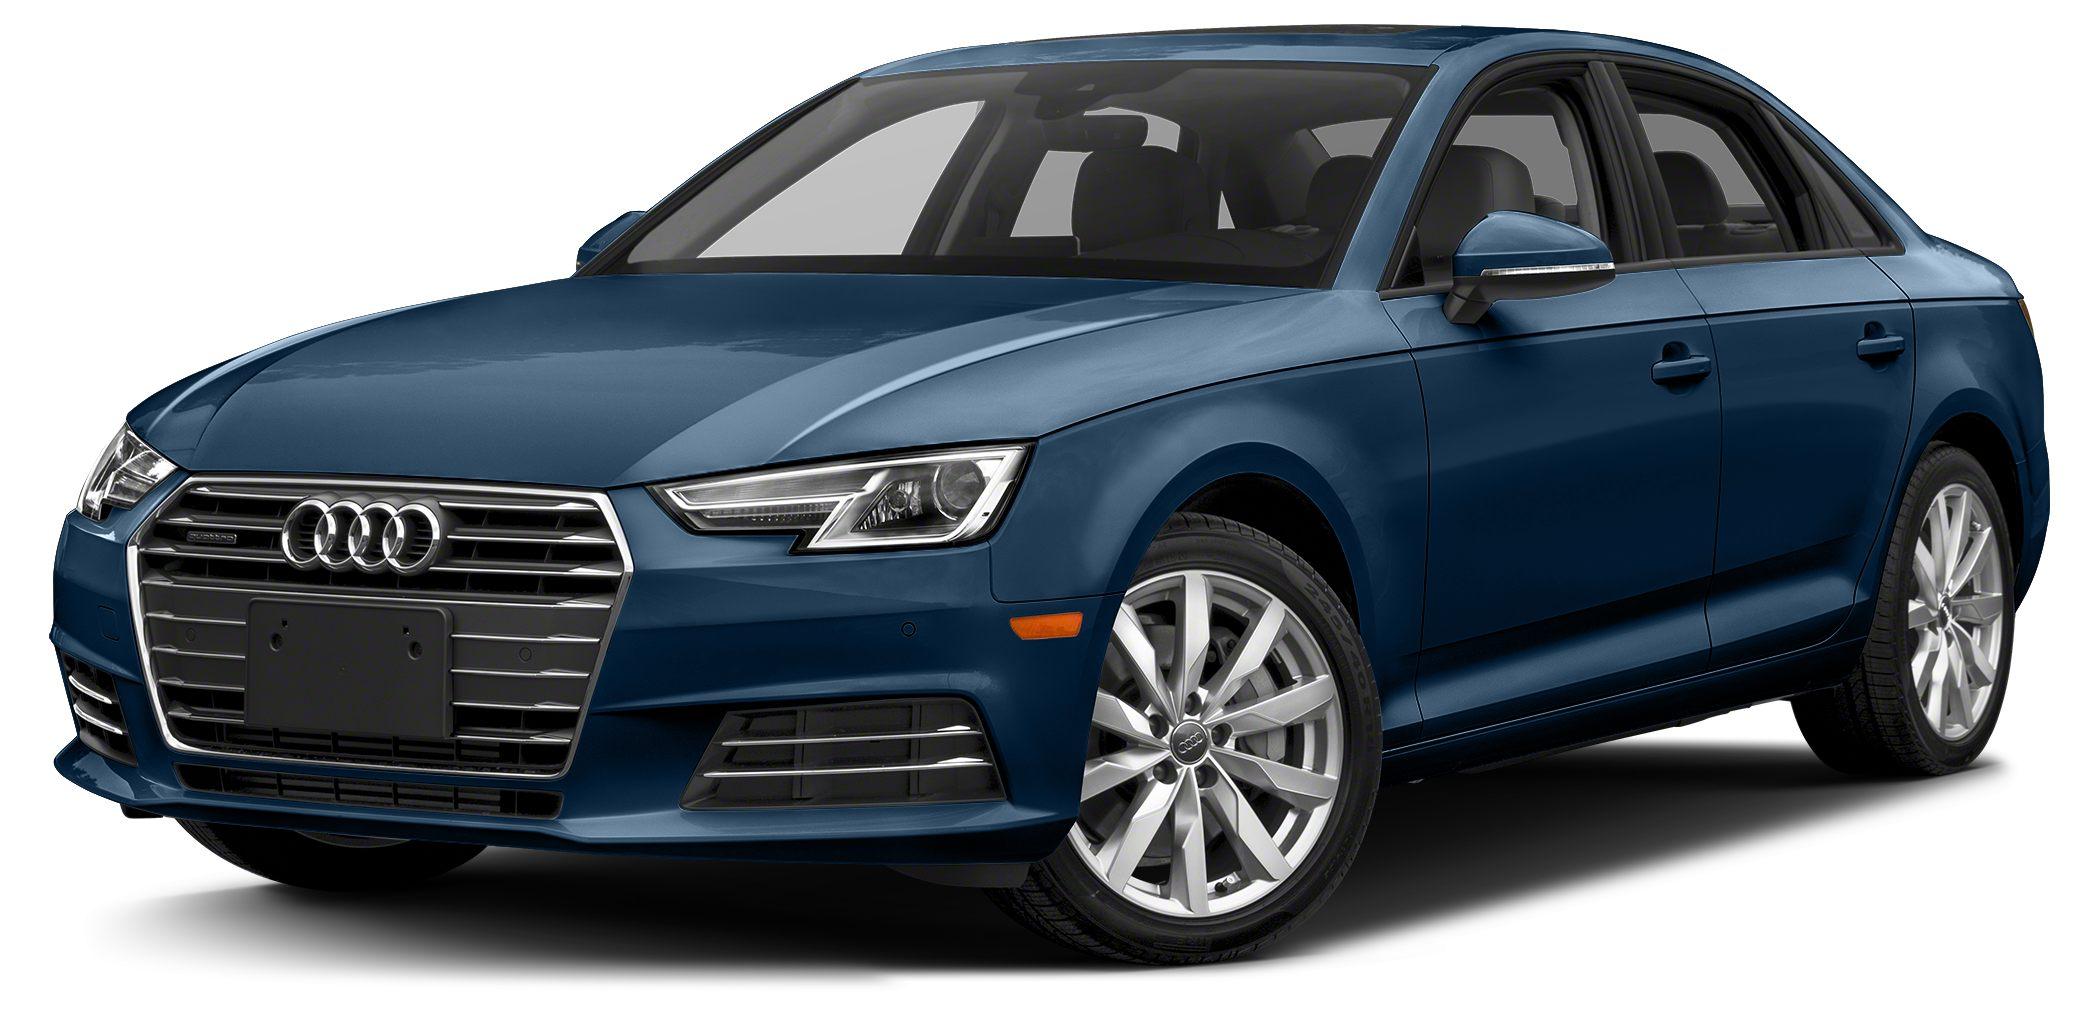 2018 Audi A4 20T Ultra Premium Optional equipment includes Premium Plus Package Natural Gray Oa